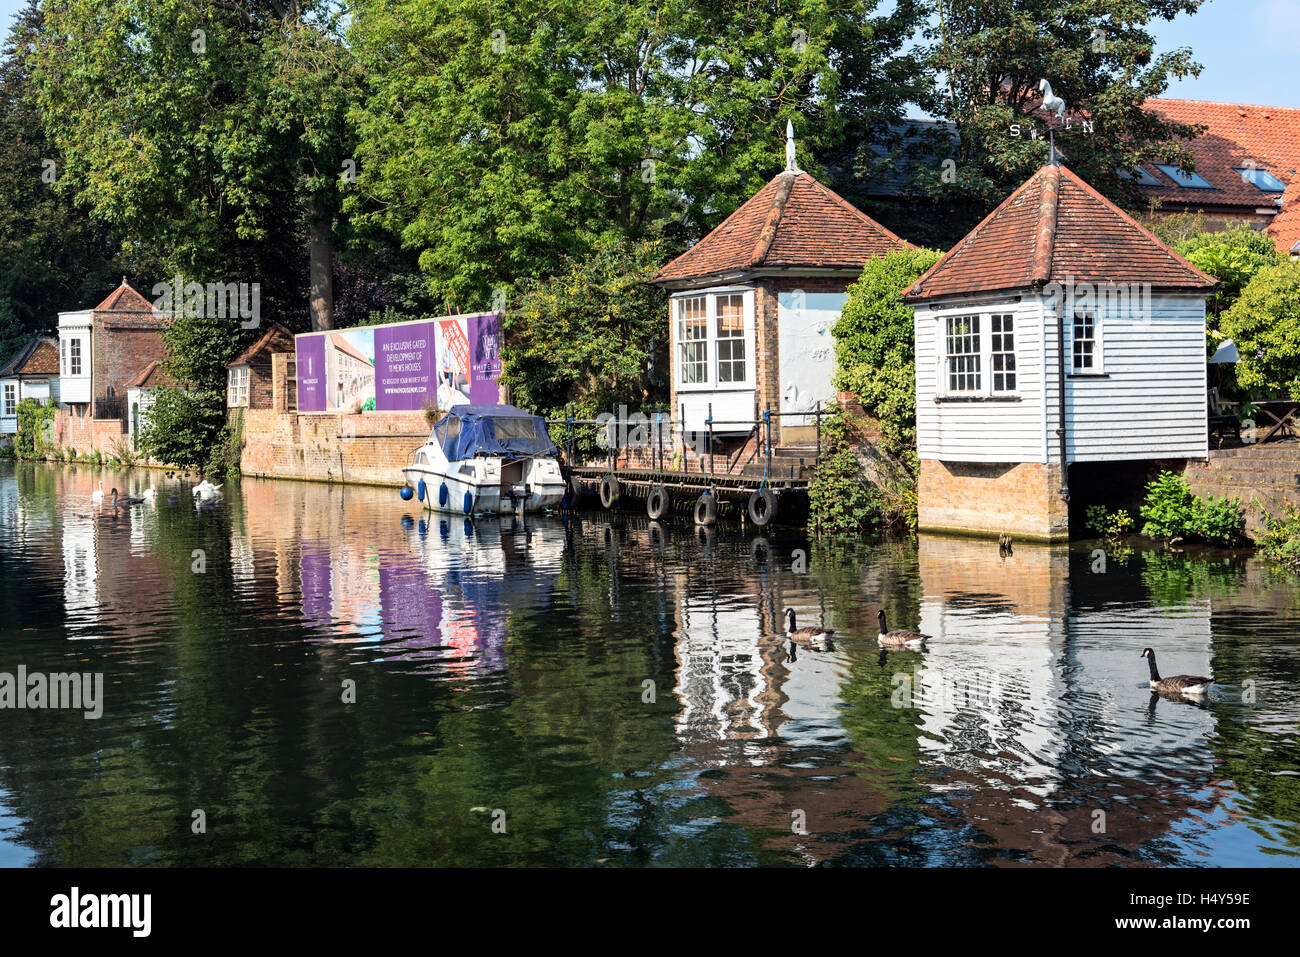 Gazebos overlooking River Lee, Ware, Hertfordshire - Stock Image